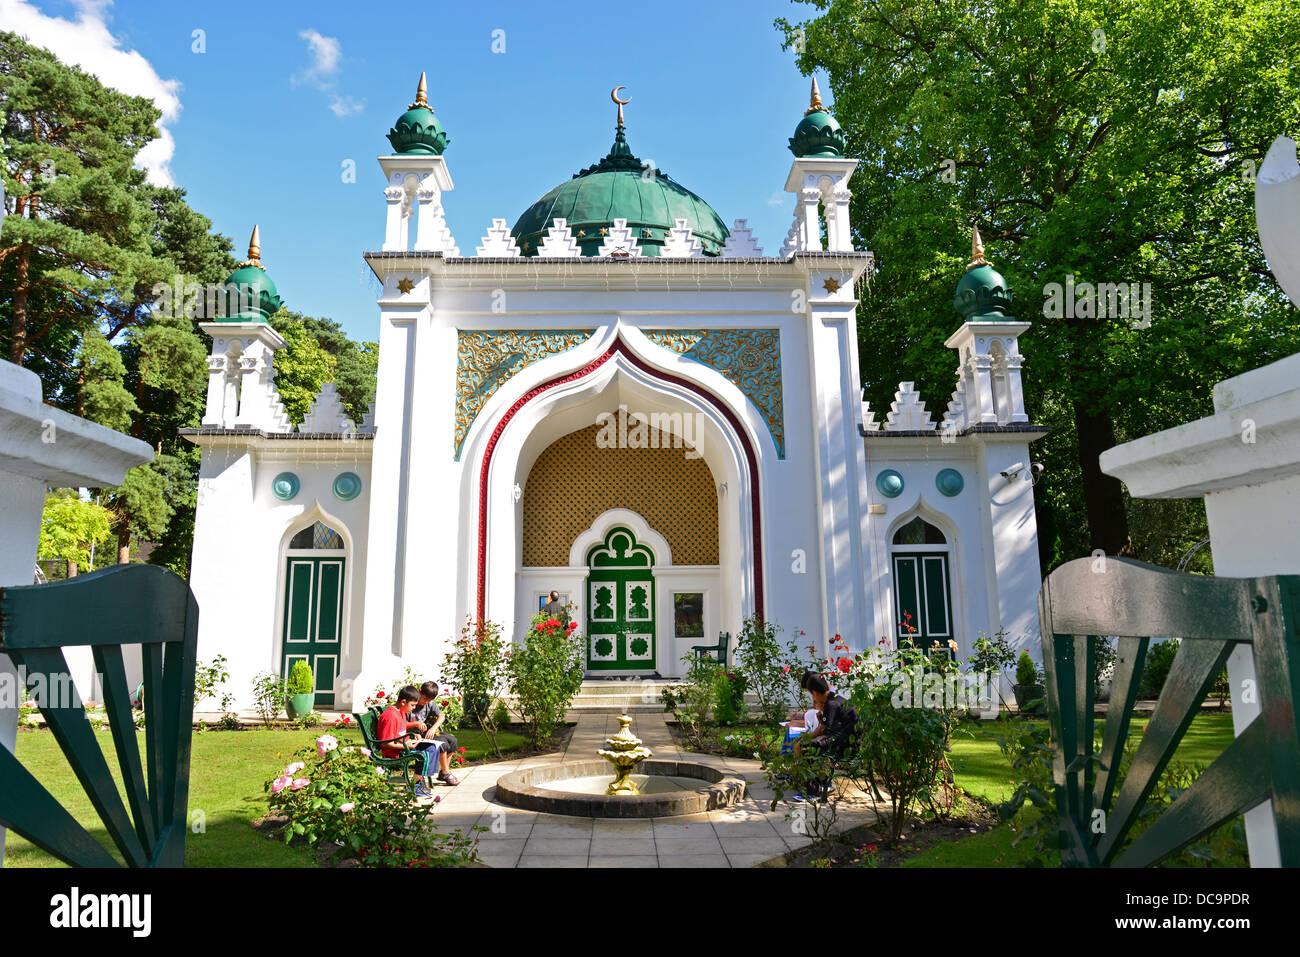 The 19th century Shah Jahan Mosque, Oriental Road, Woking, Surrey, England, United Kingdom - Stock Image